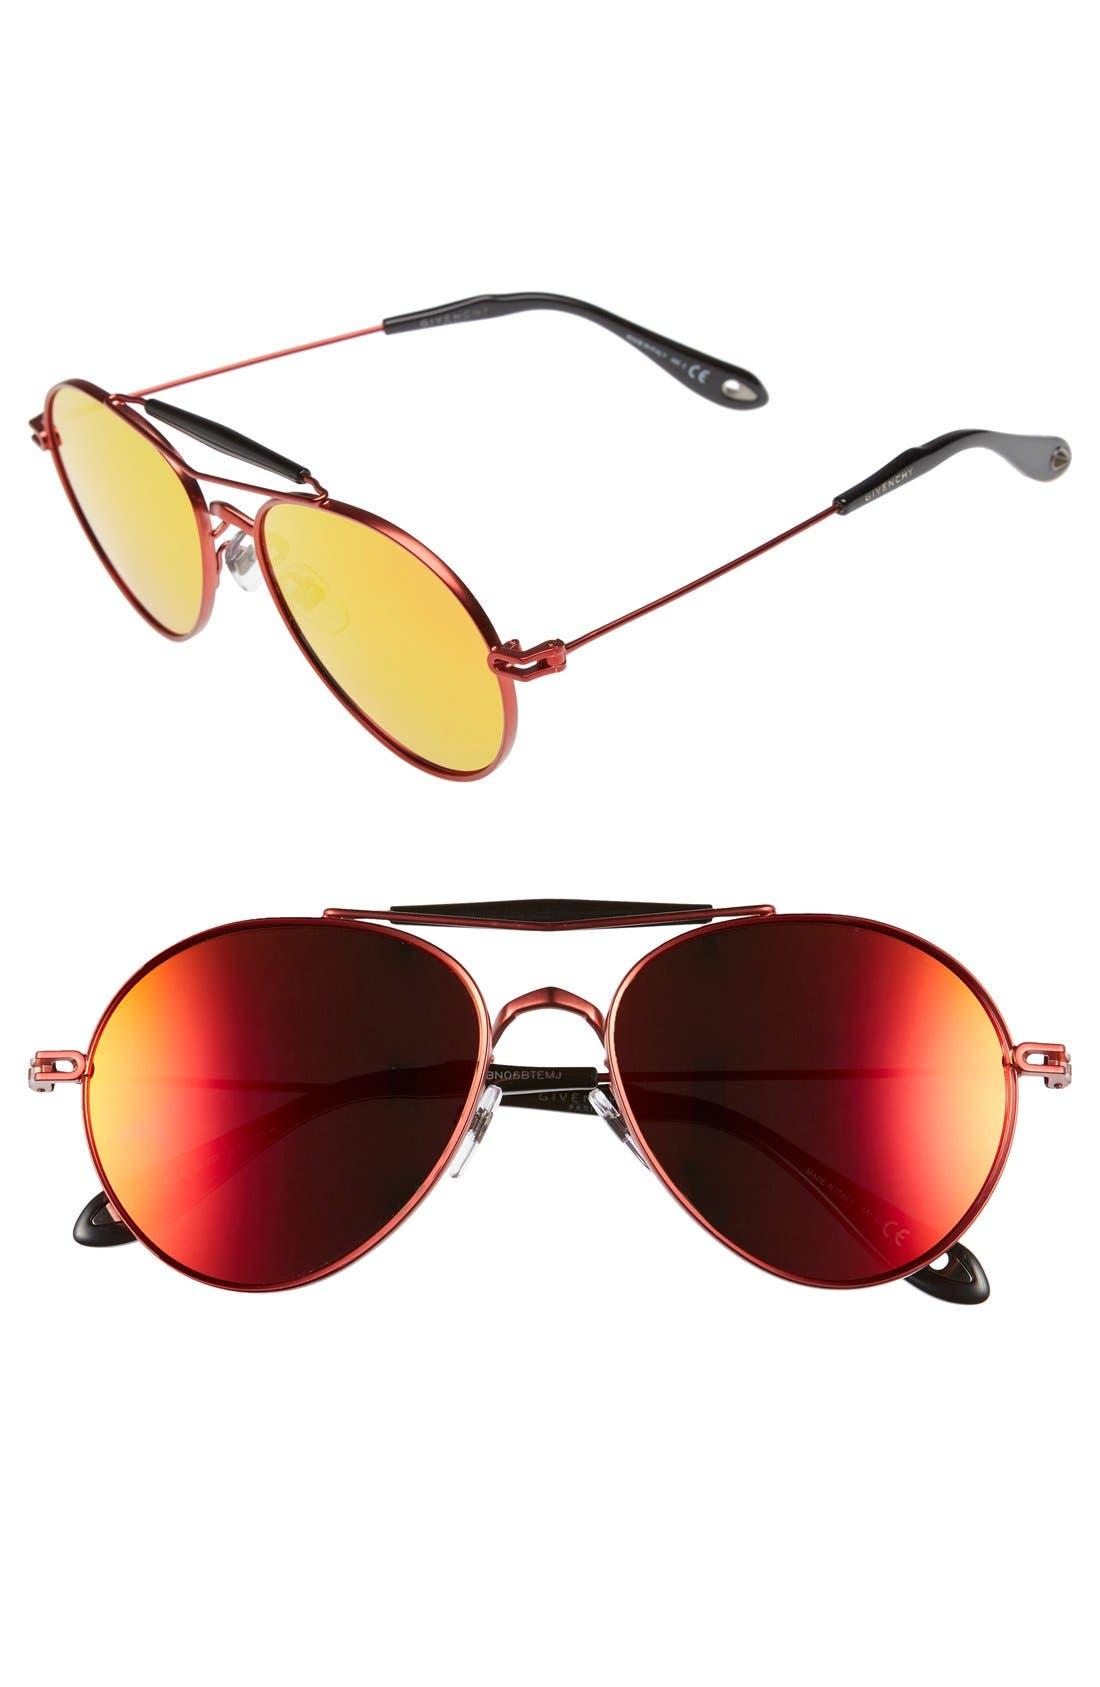 Main Image - Givenchy 56mm Aviator Sunglasses